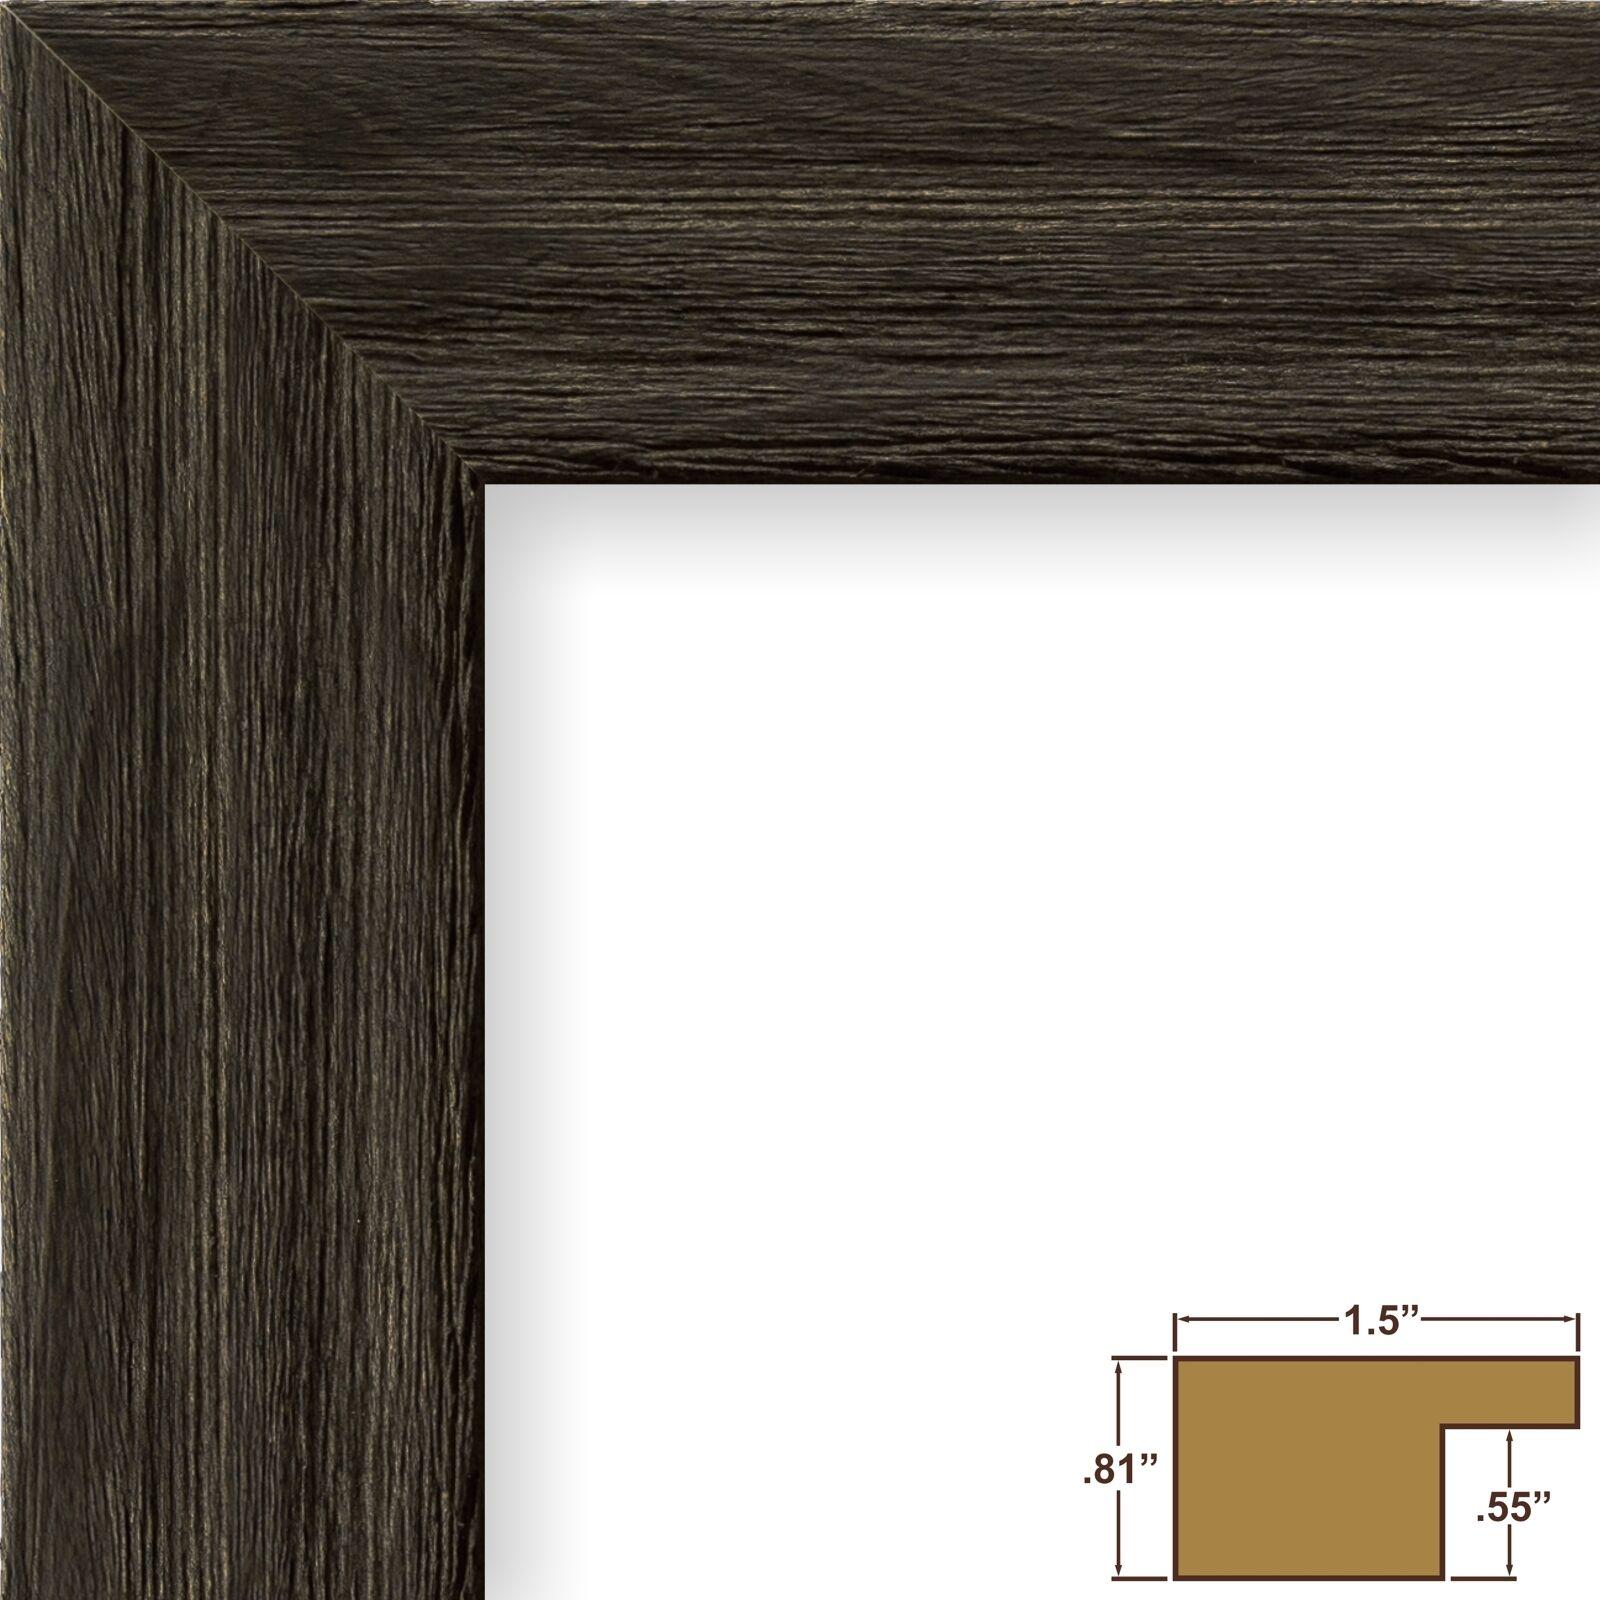 Craig Frames 1.5driftwoodbk 11x17 Picture/poster Frame Wood Grain ...